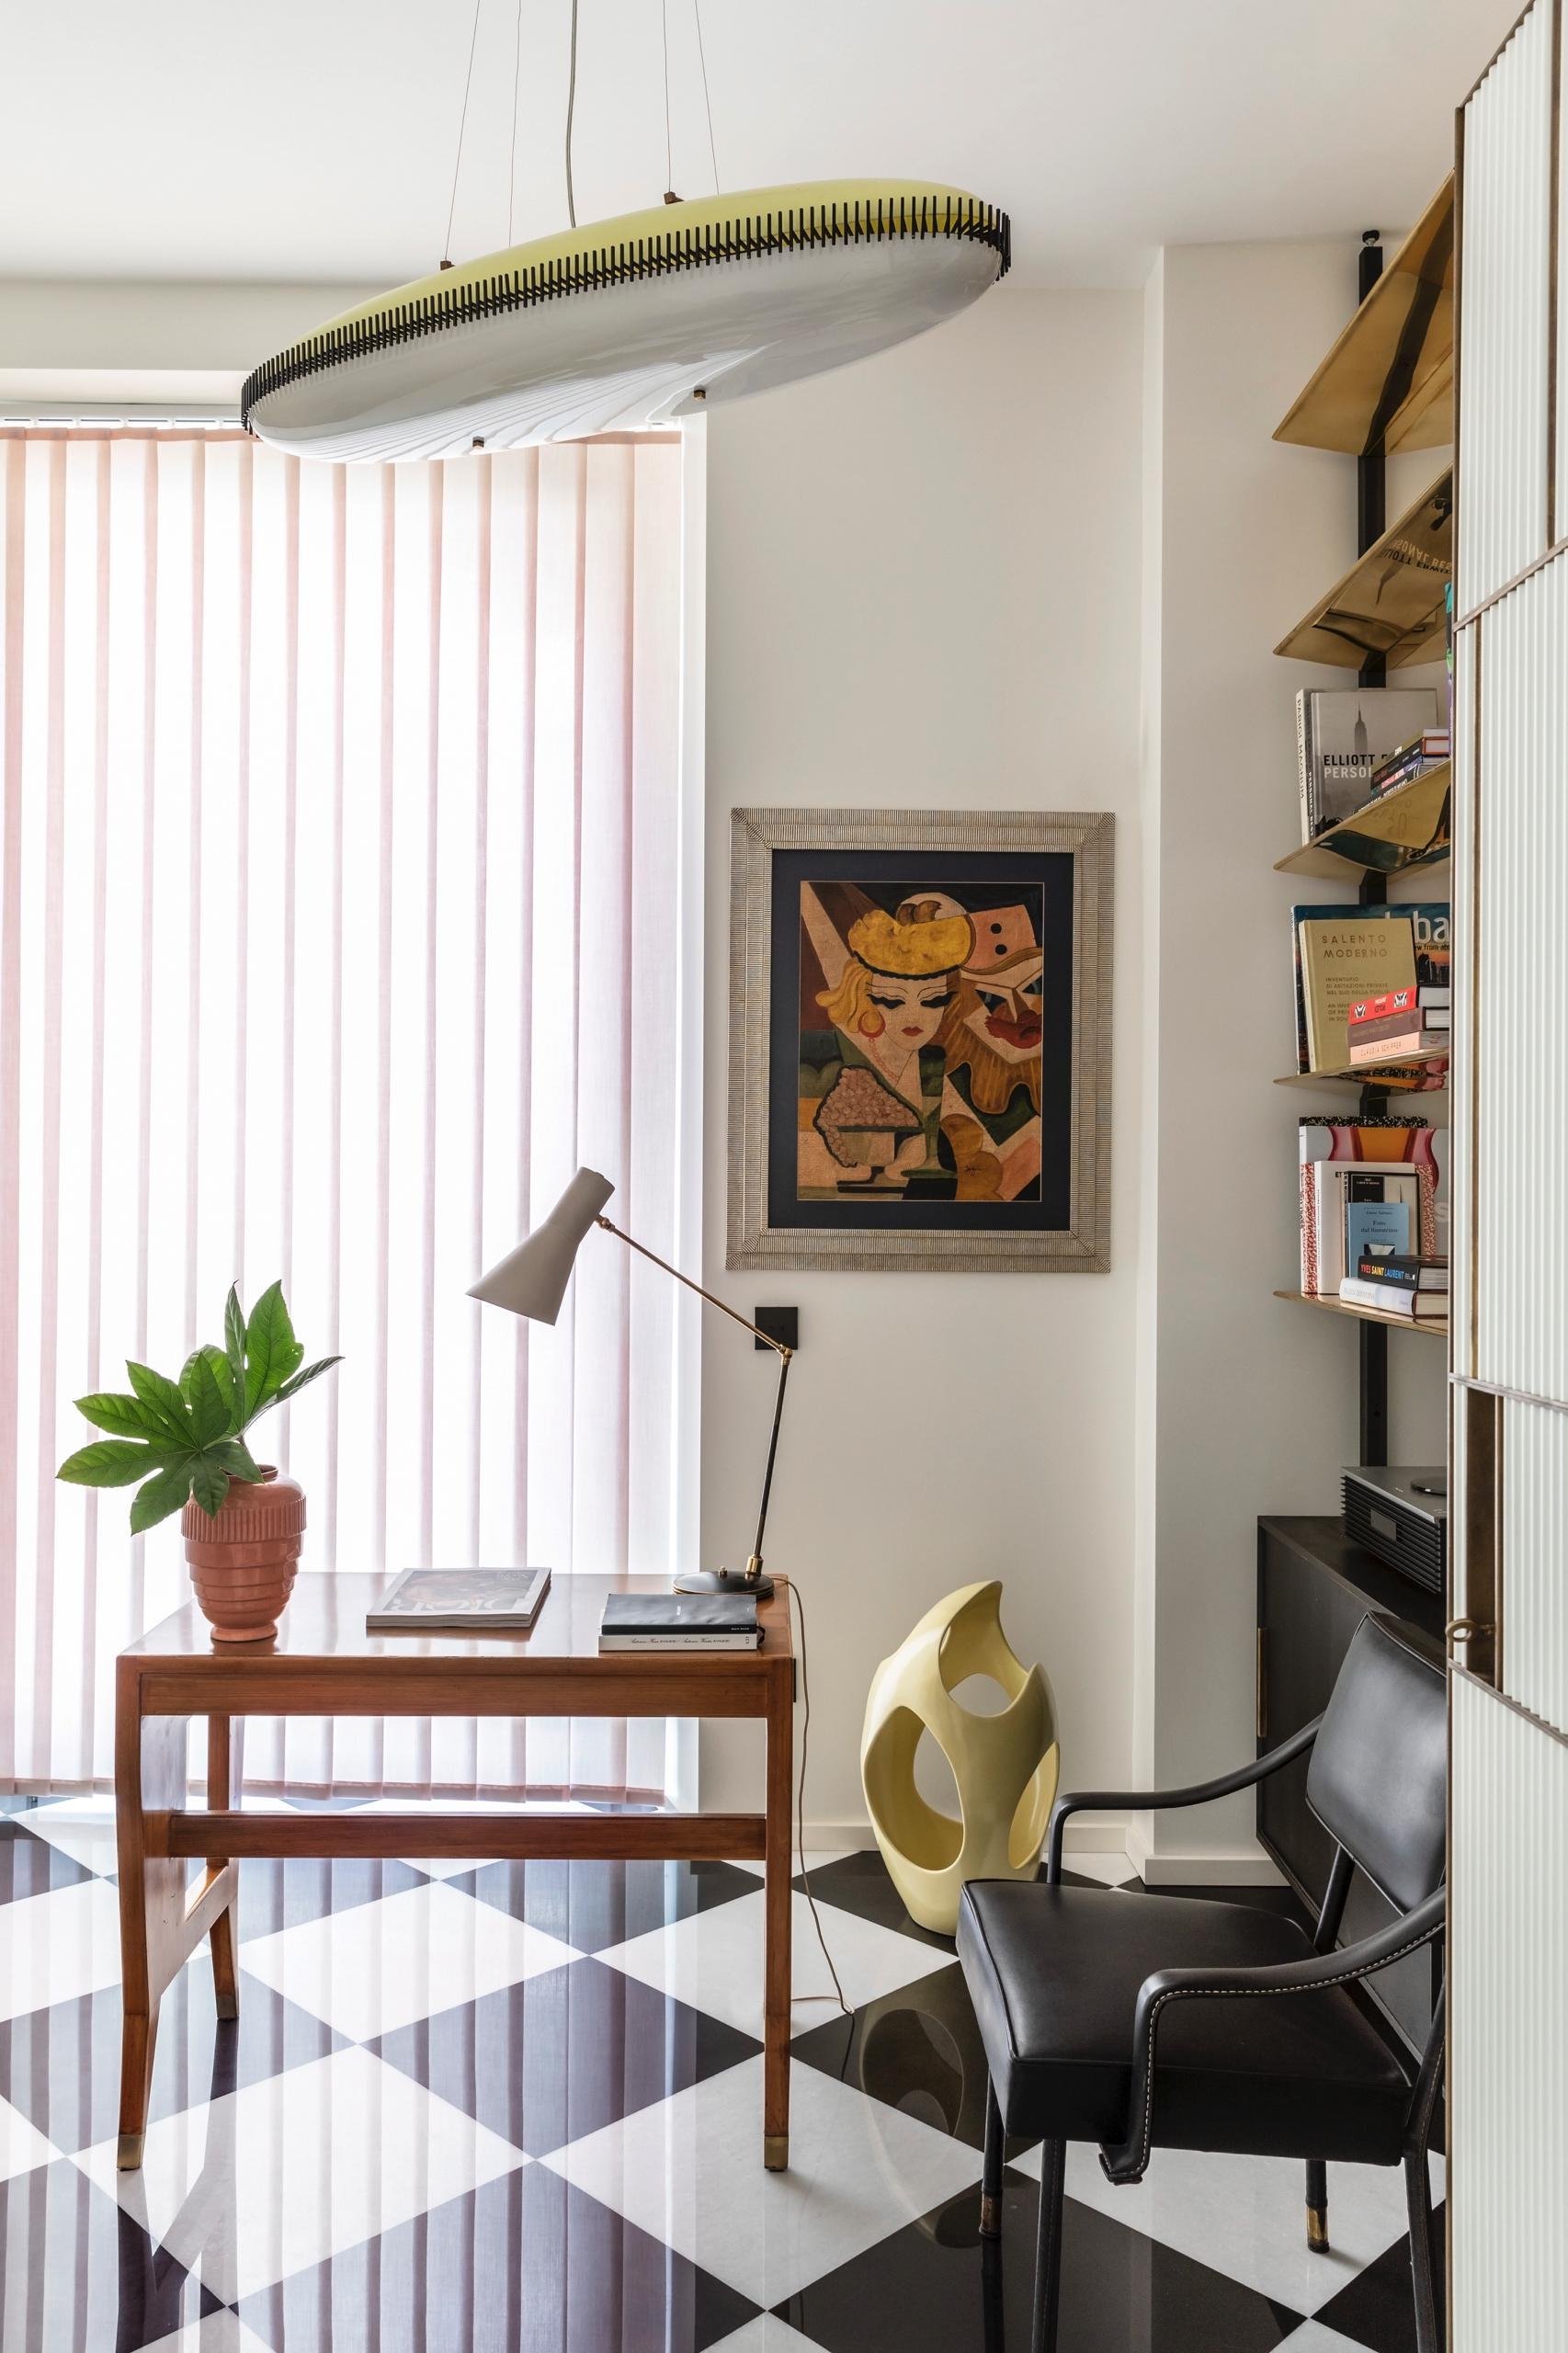 design-ideen-nilufar-gallery-mailand-homestory-decohome.de-home-office